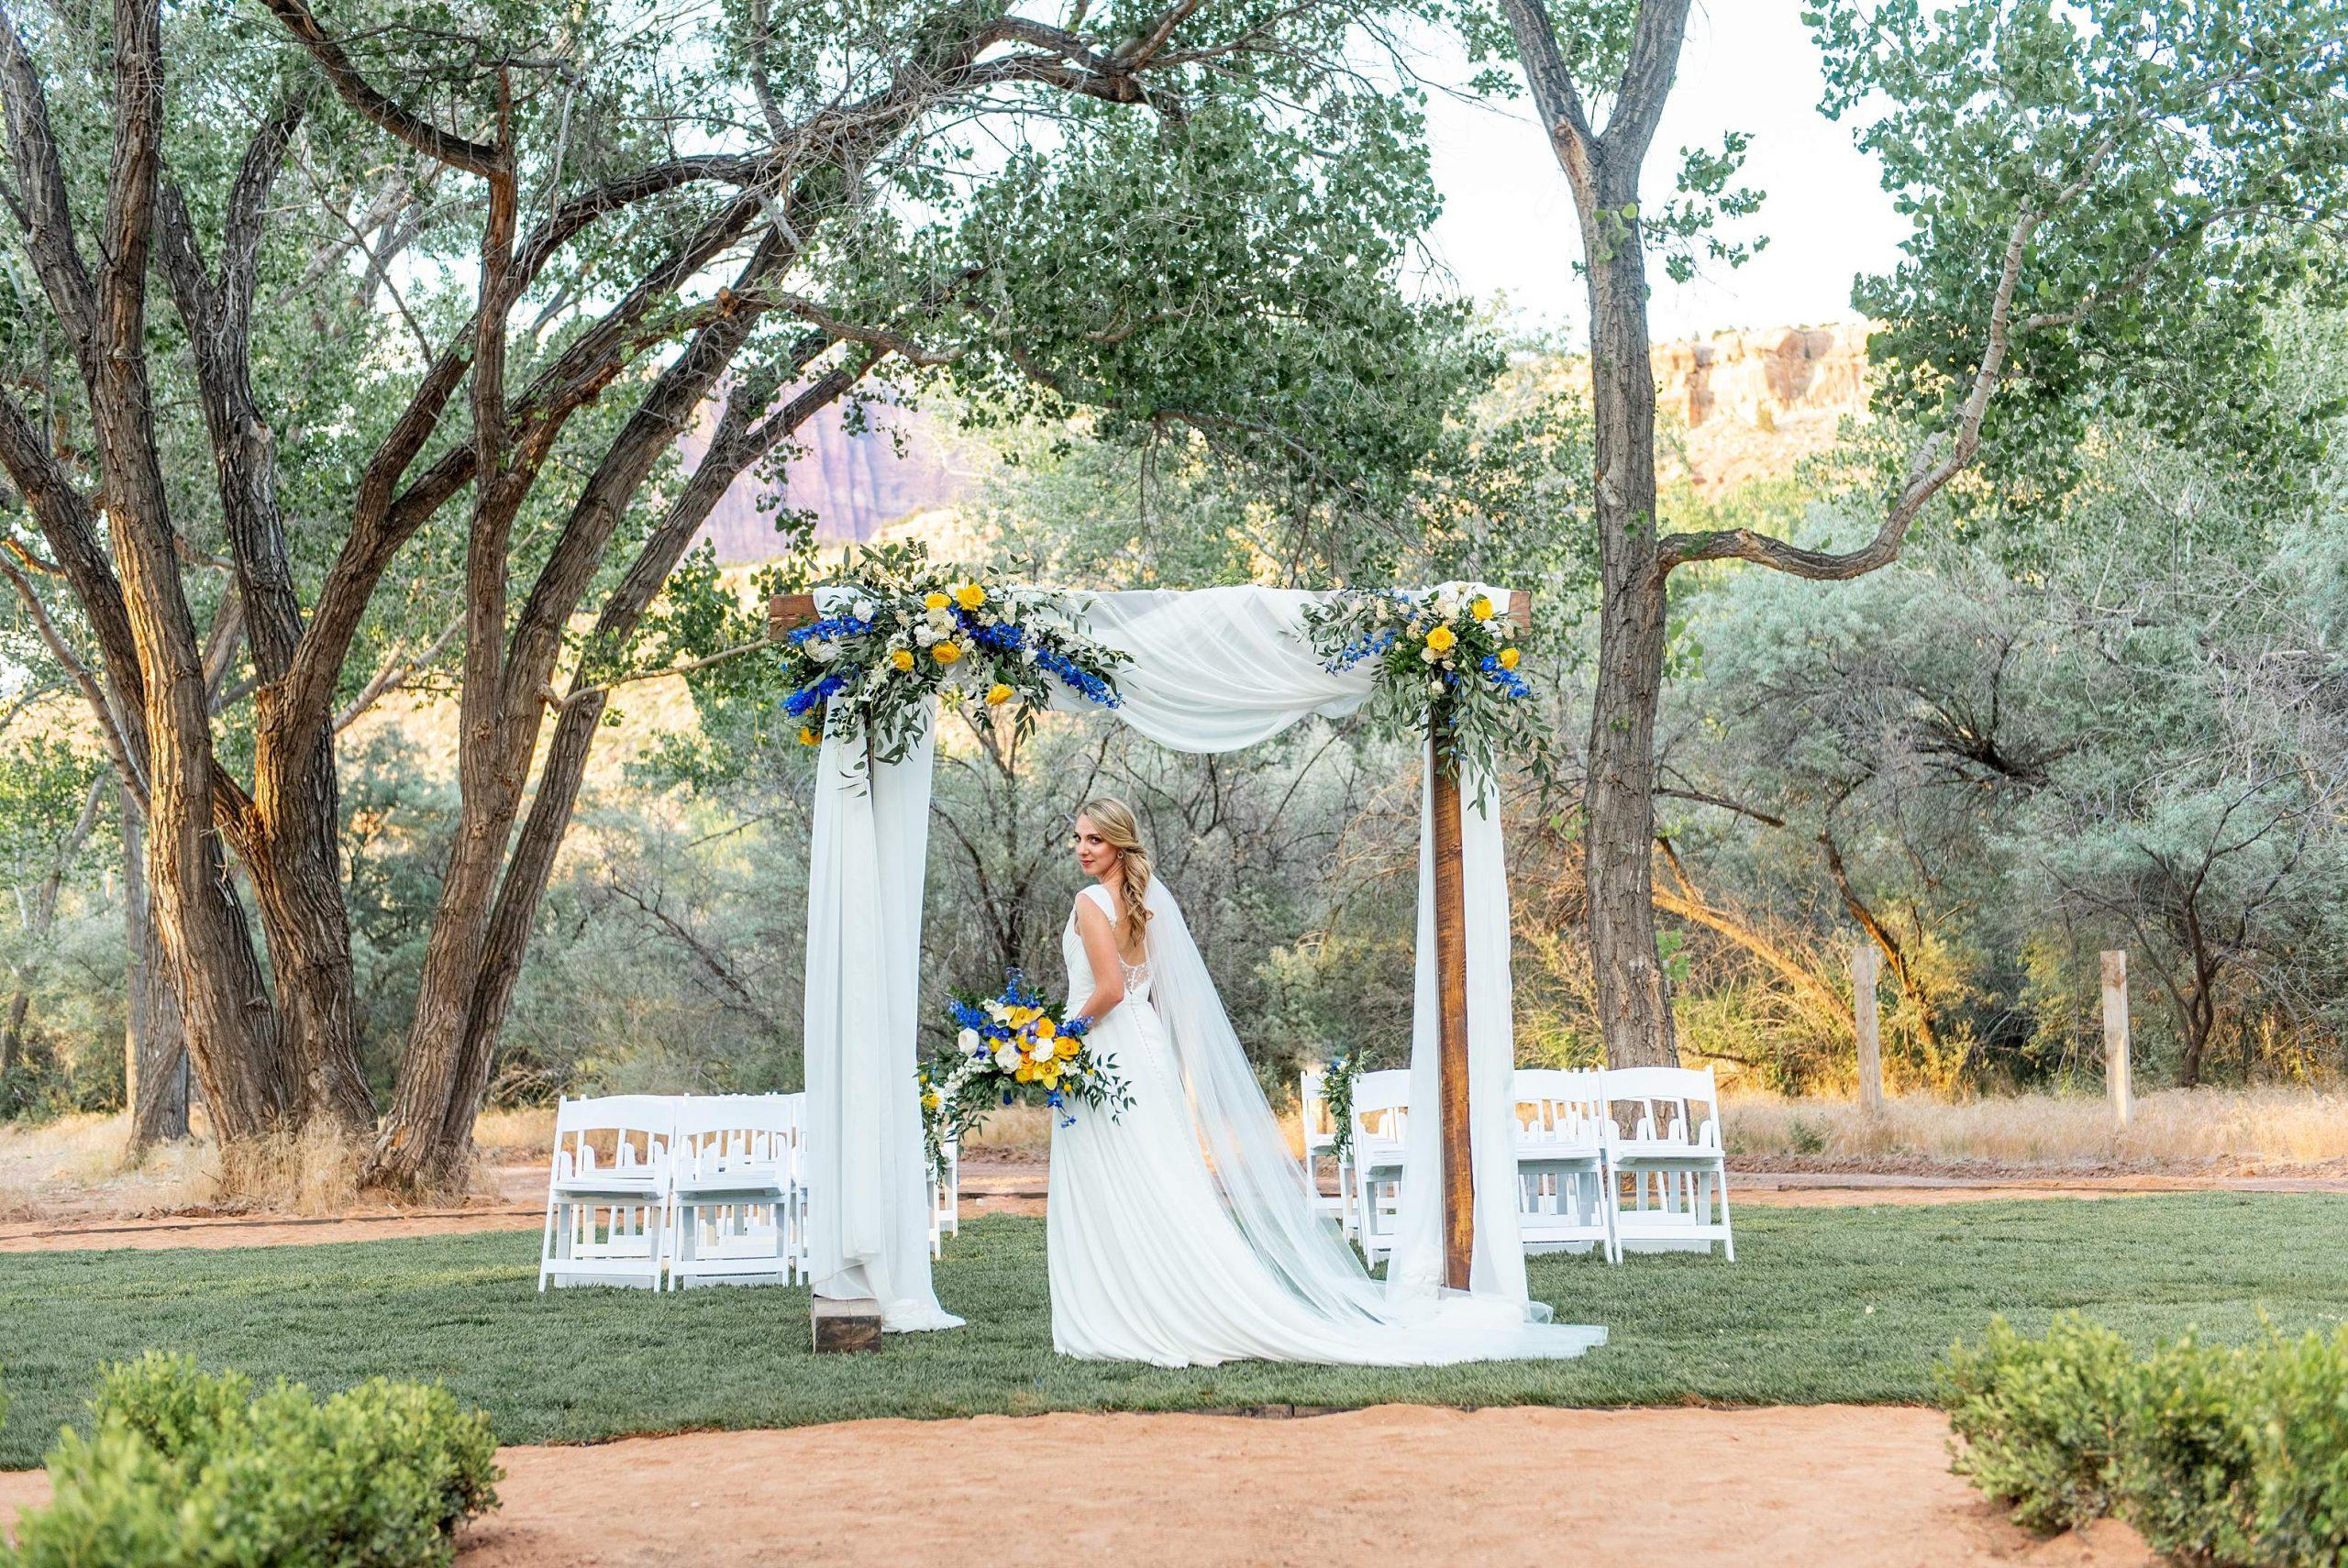 zion wedding rentals and planning in southern utah destination brides